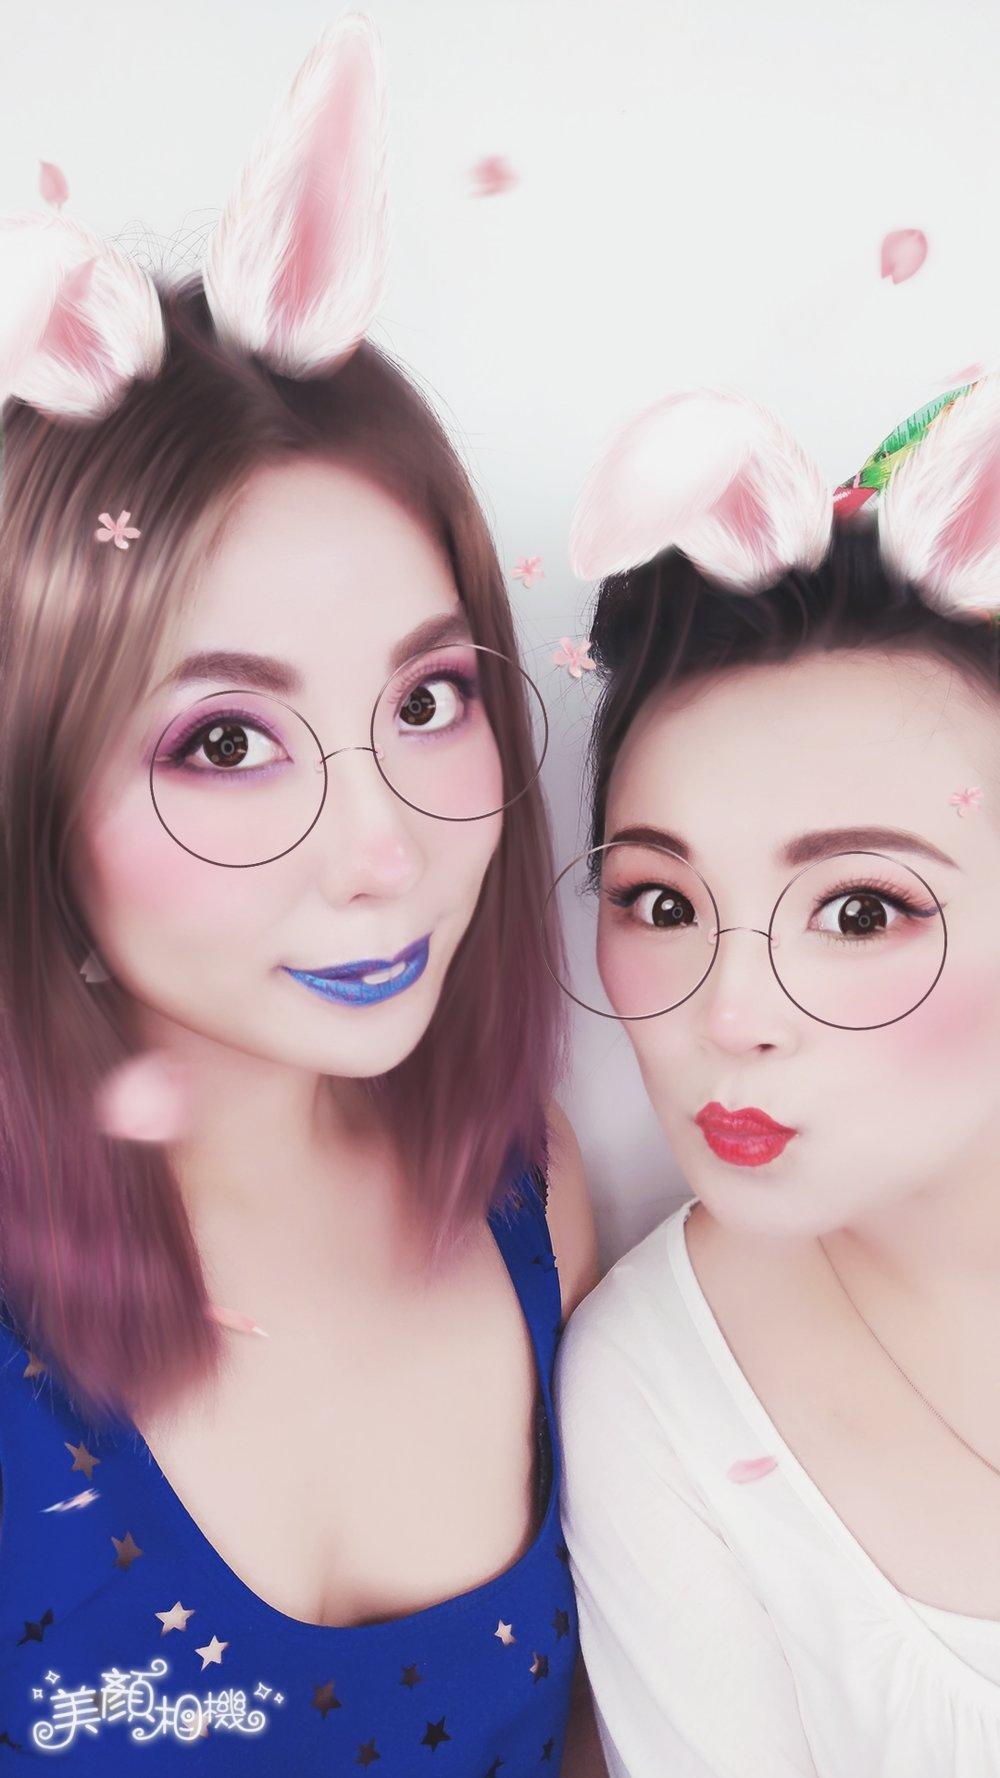 MYXJ_20170917155157_fast[1].jpg